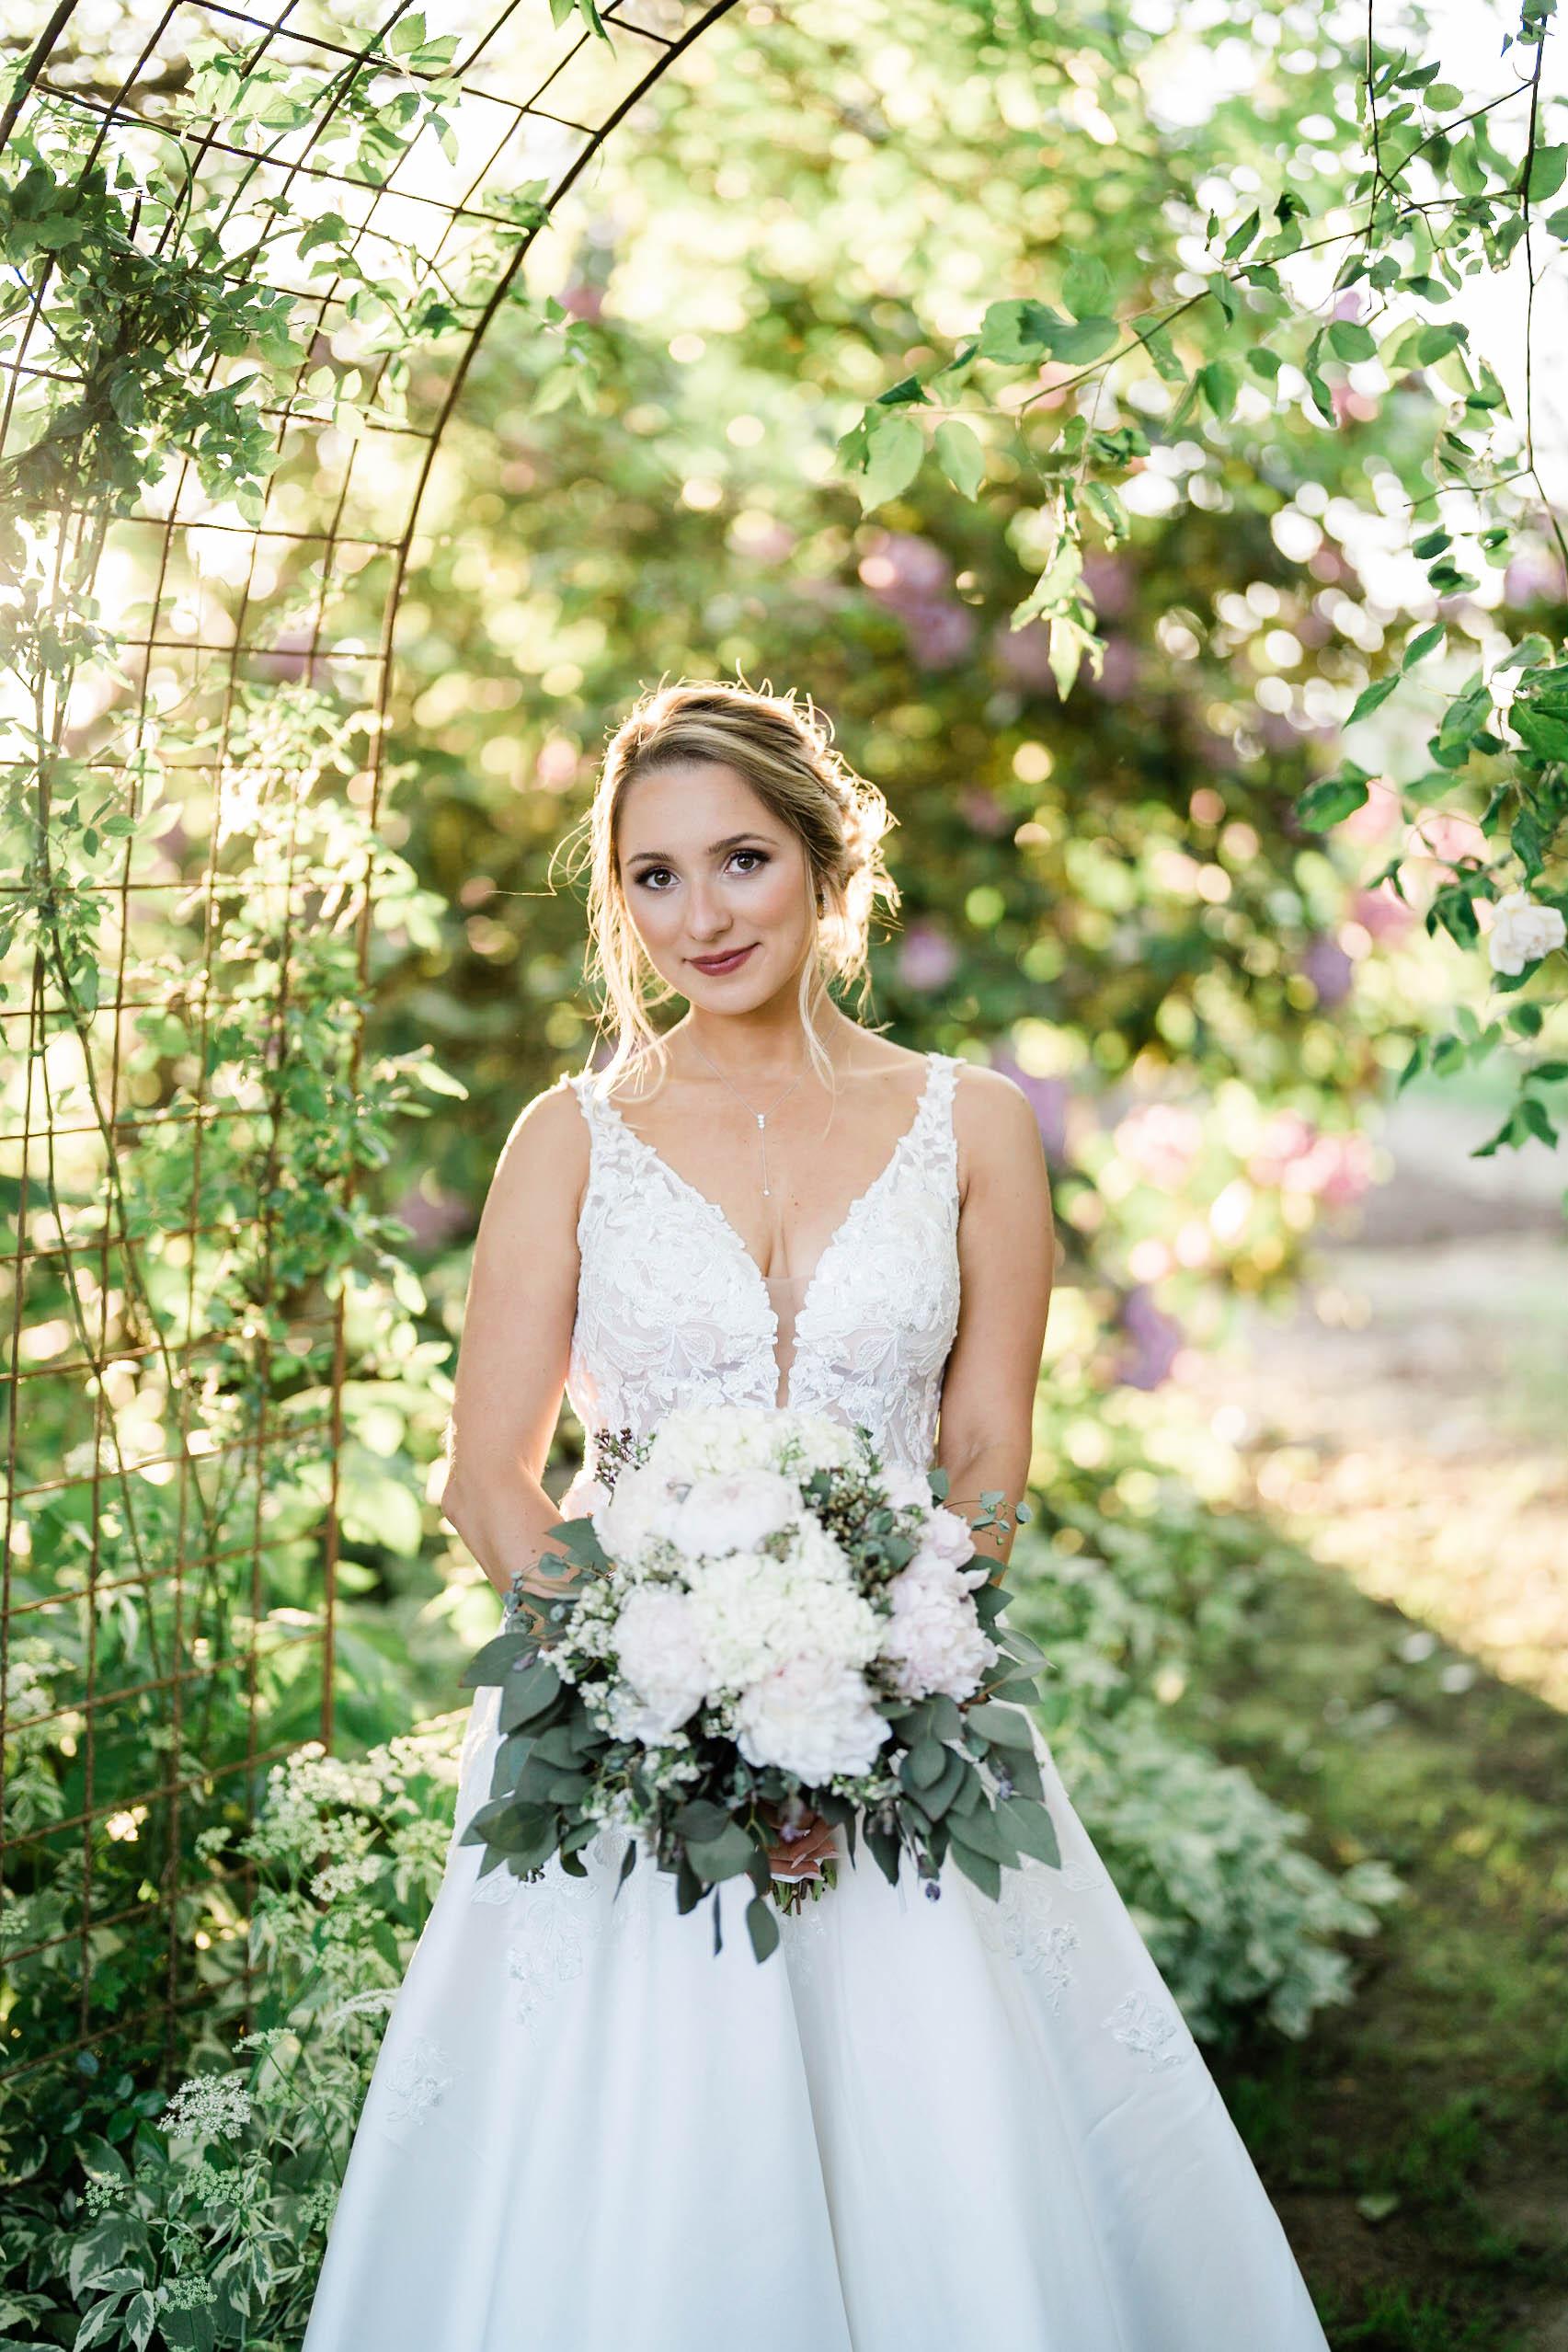 bridal portrait photography at craven farm wedding in seattle